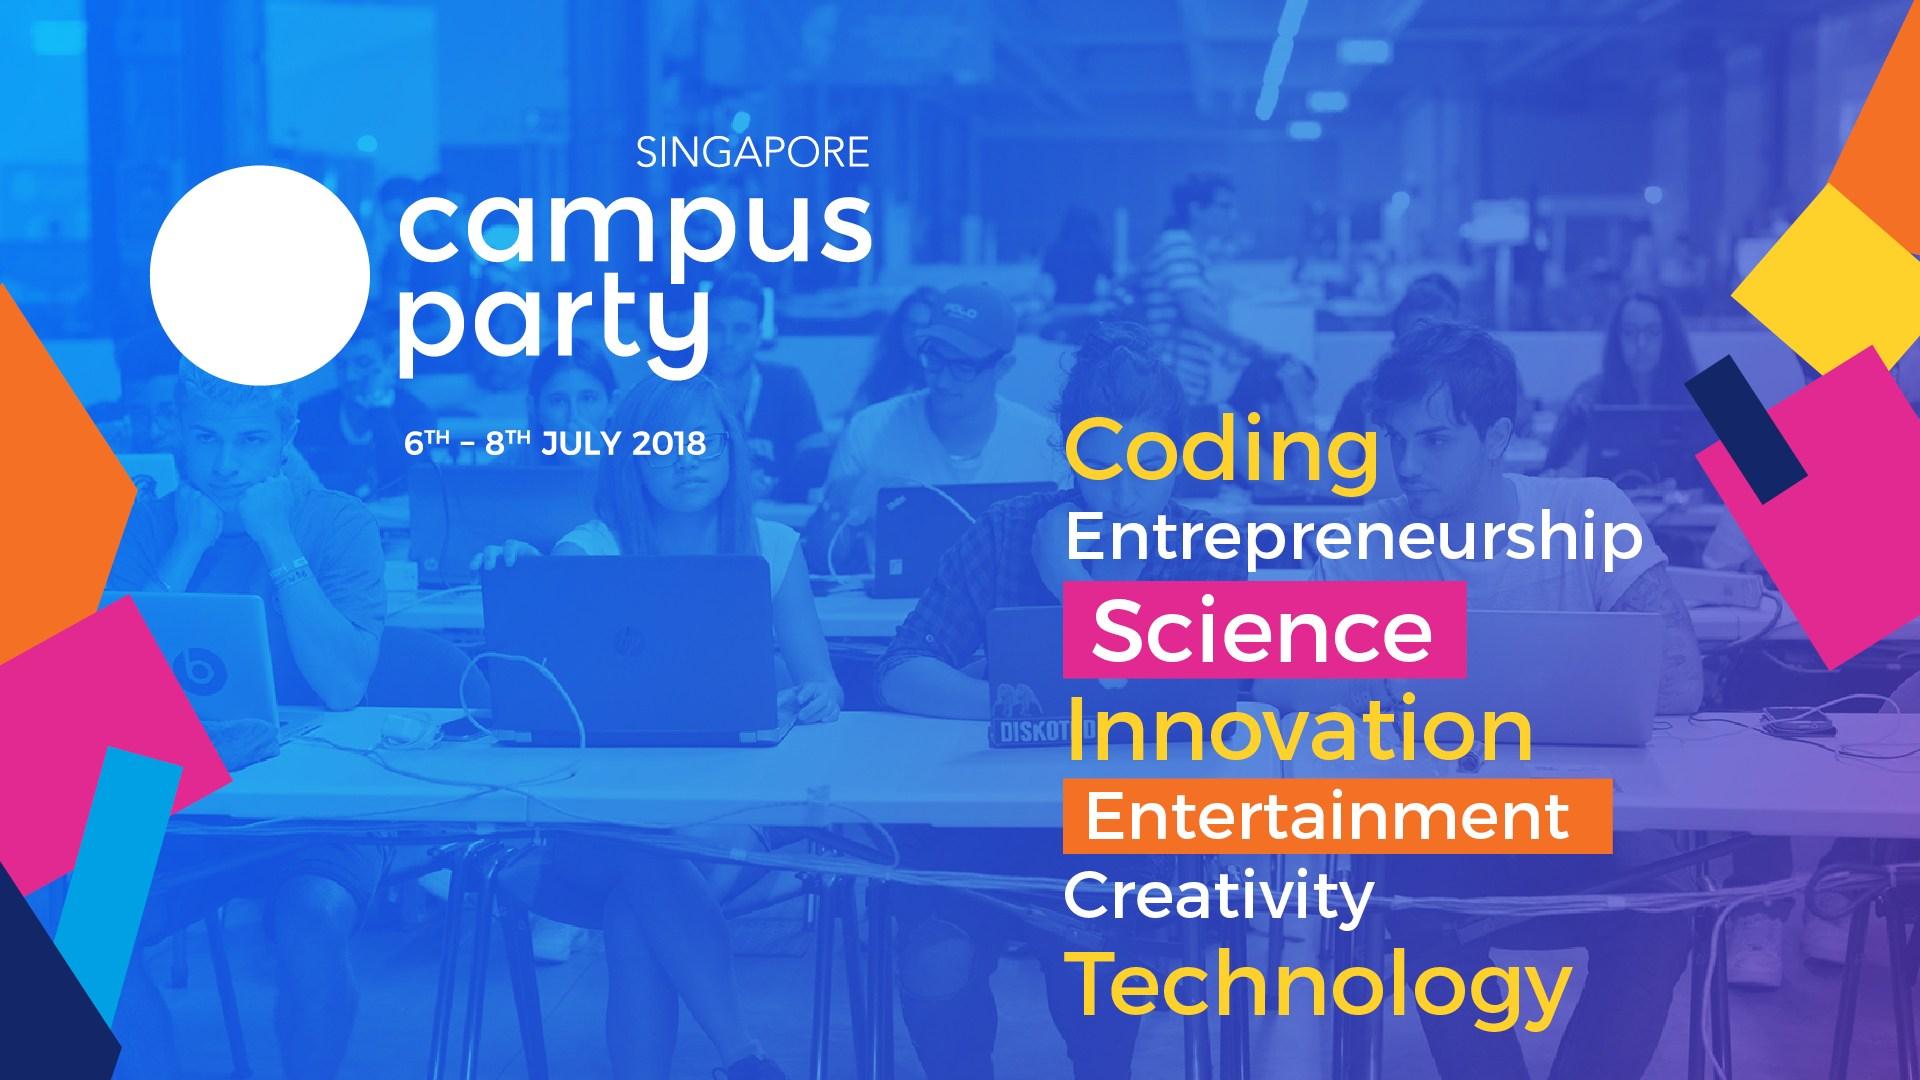 Campus Party Singapore 2018